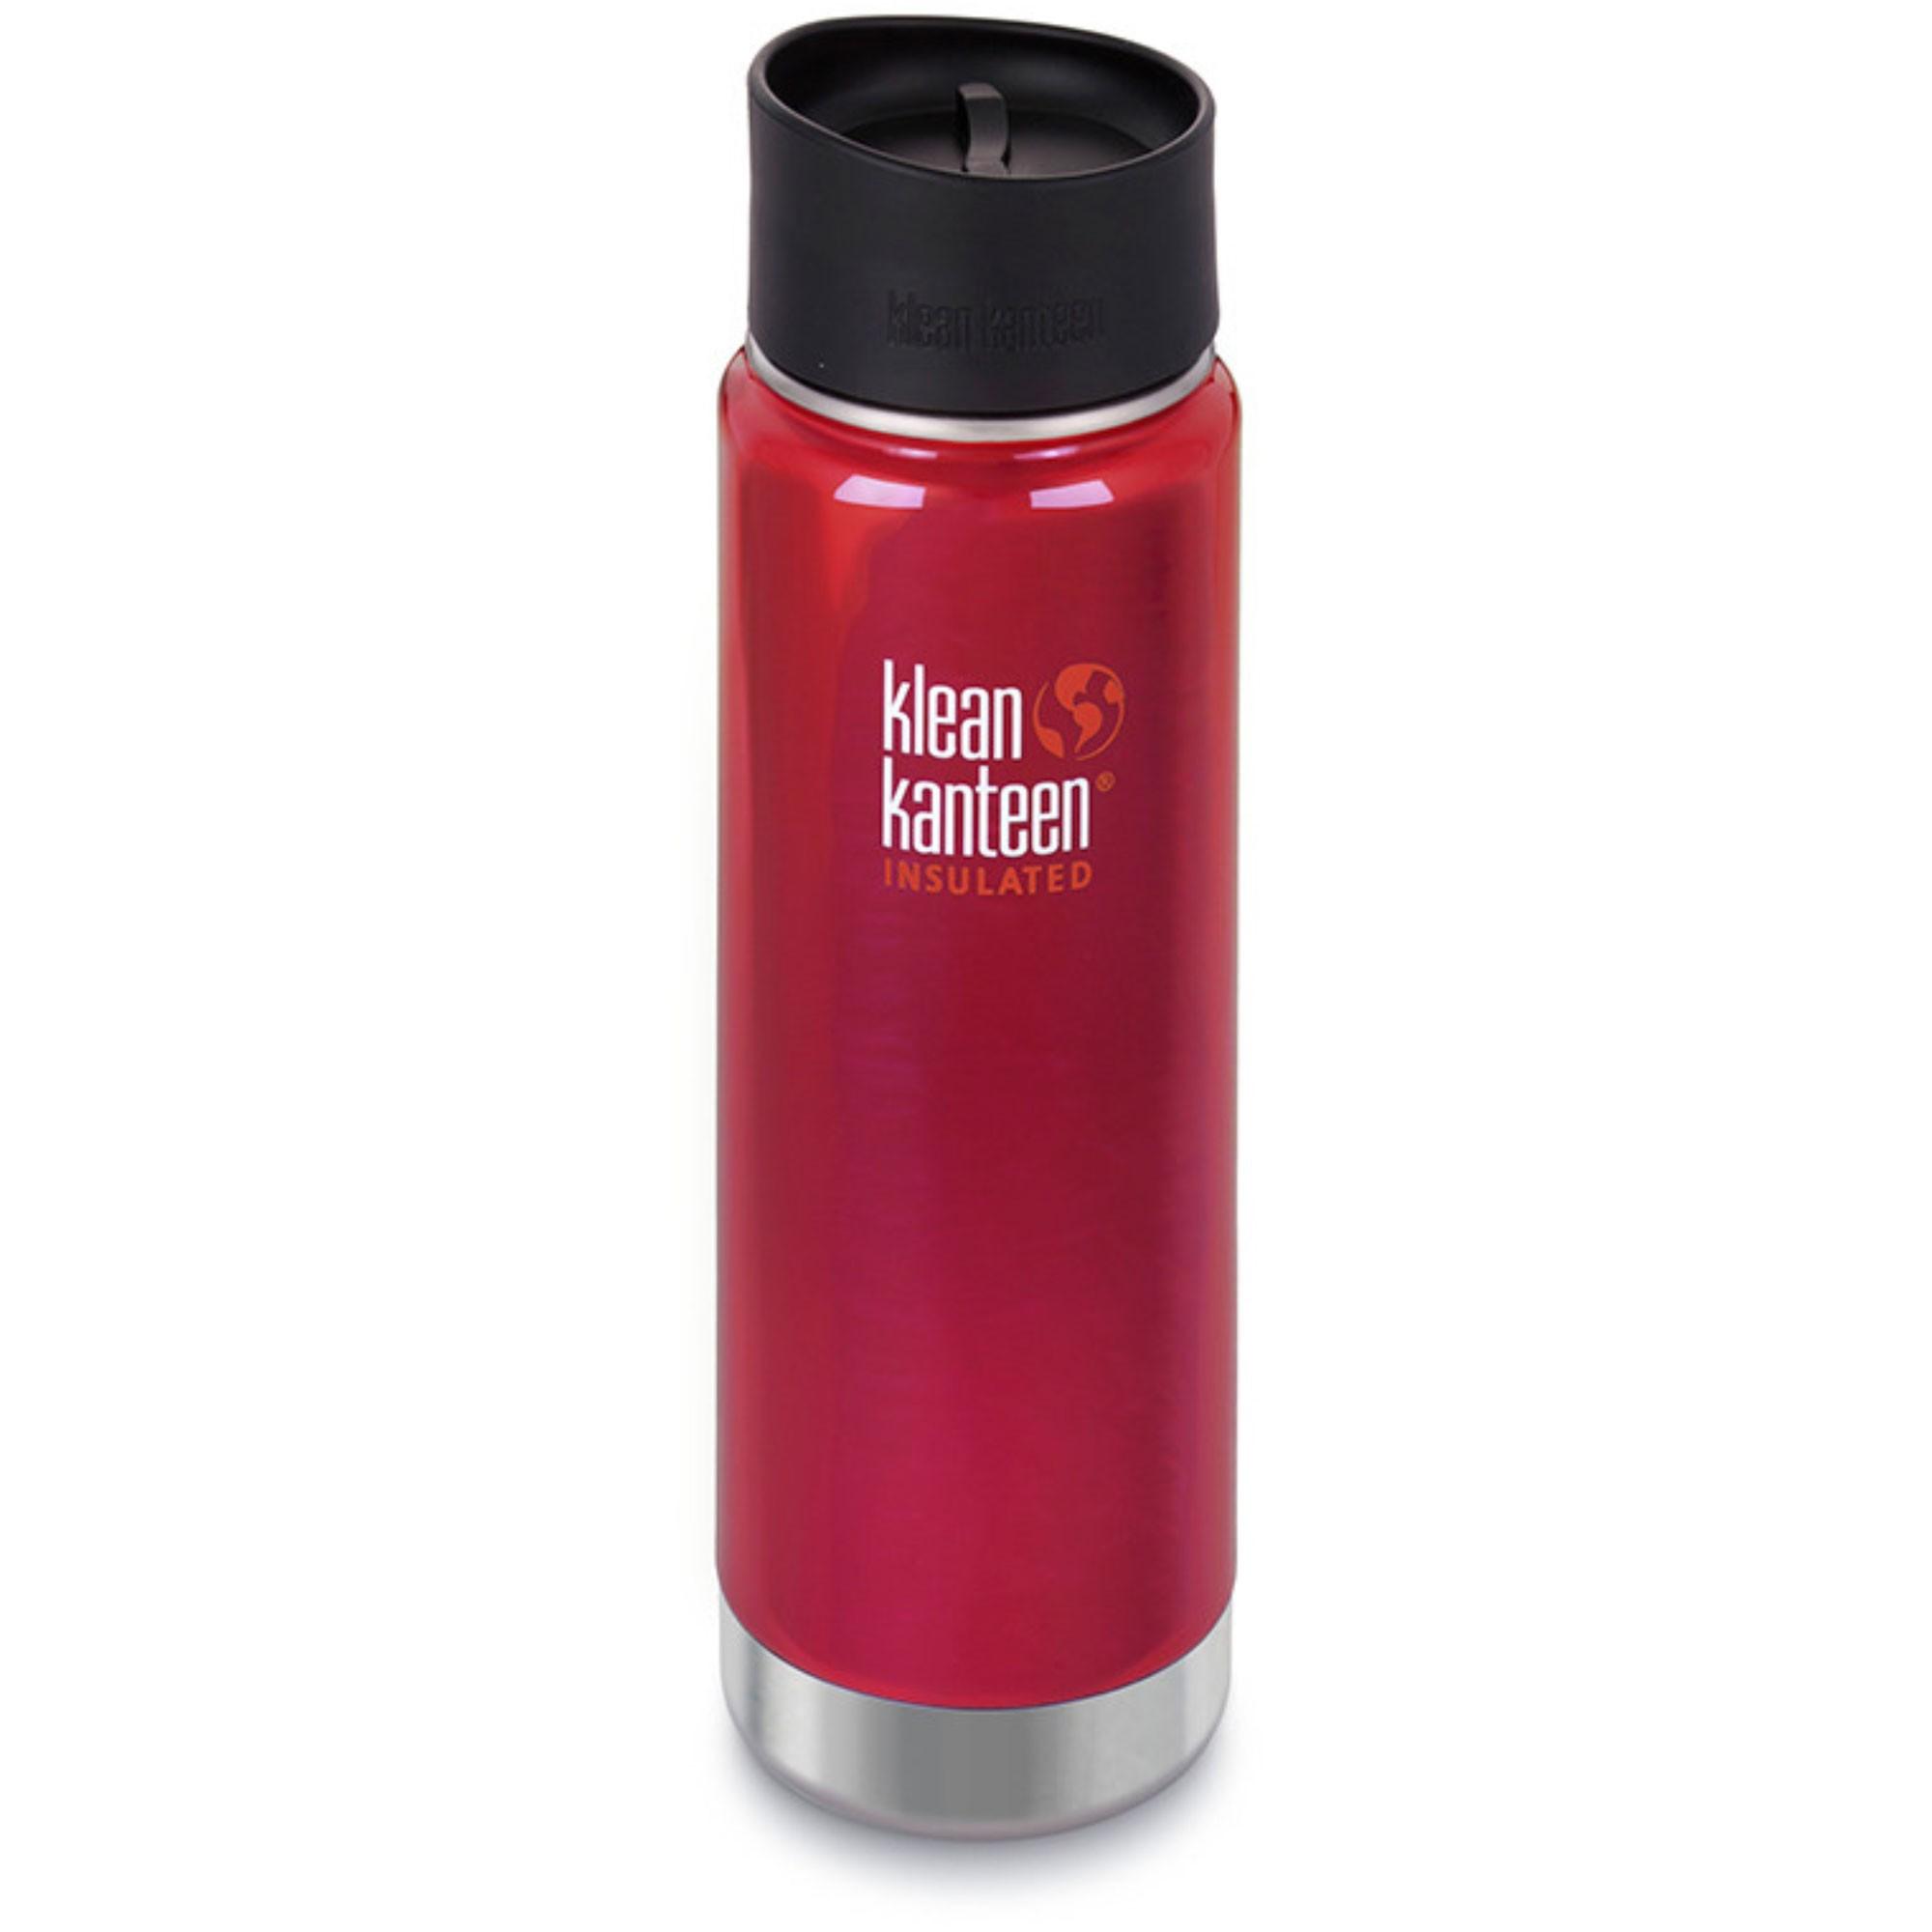 KLEAN KANTEEN - Insulated Cafe Cap Flask - 592ml - Roasted Pepper